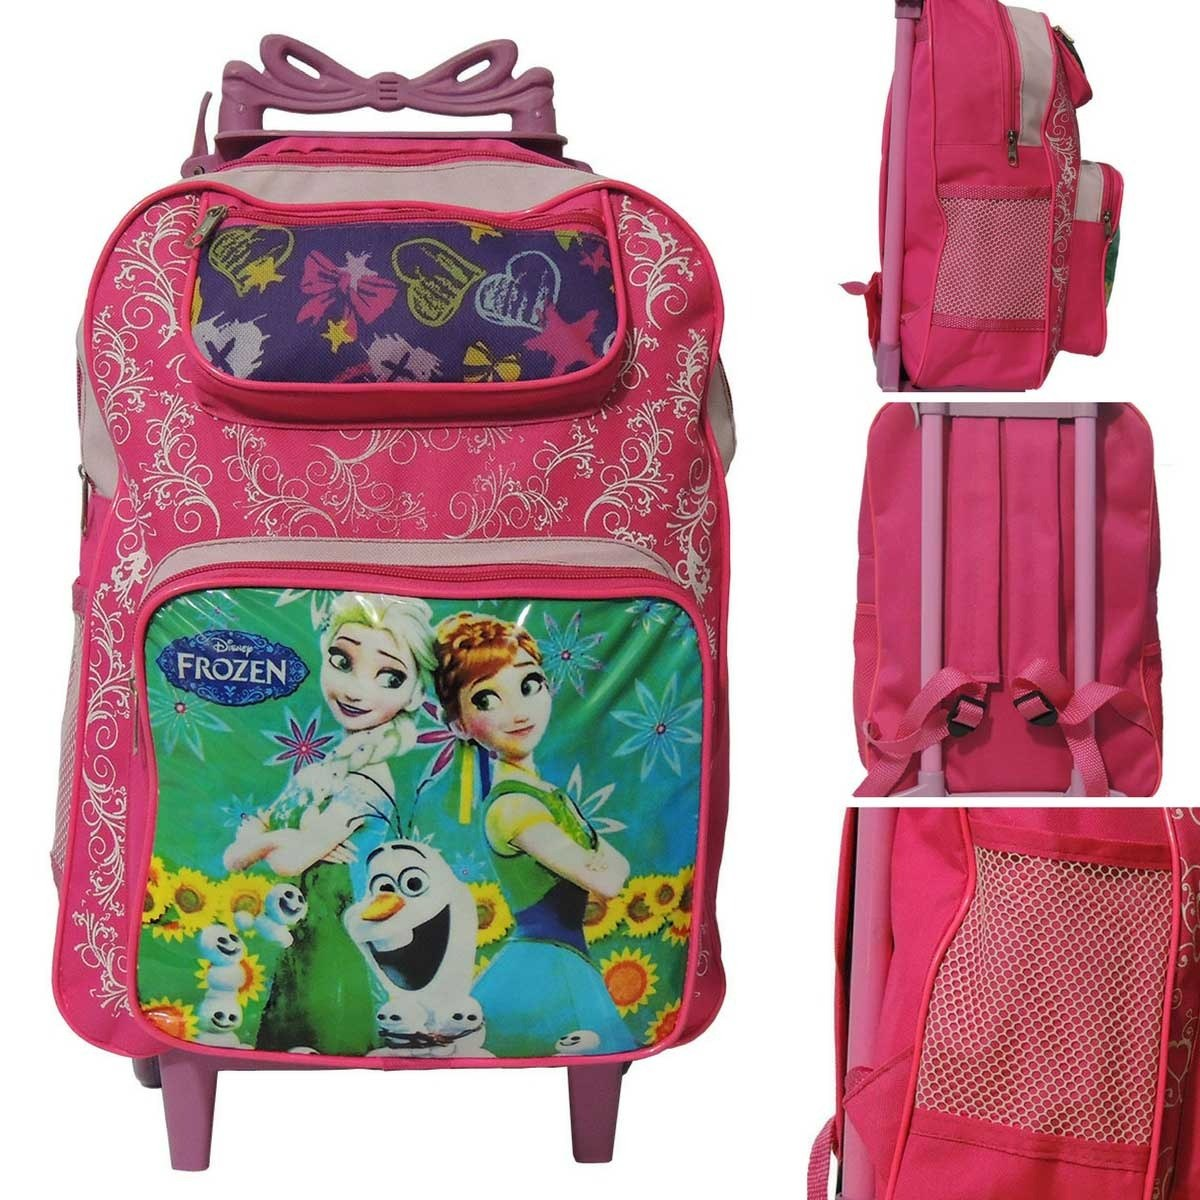 2891ec7a4 mochila de rodinha infantil feminina frozen elsa e anna (g). Carregando zoom .